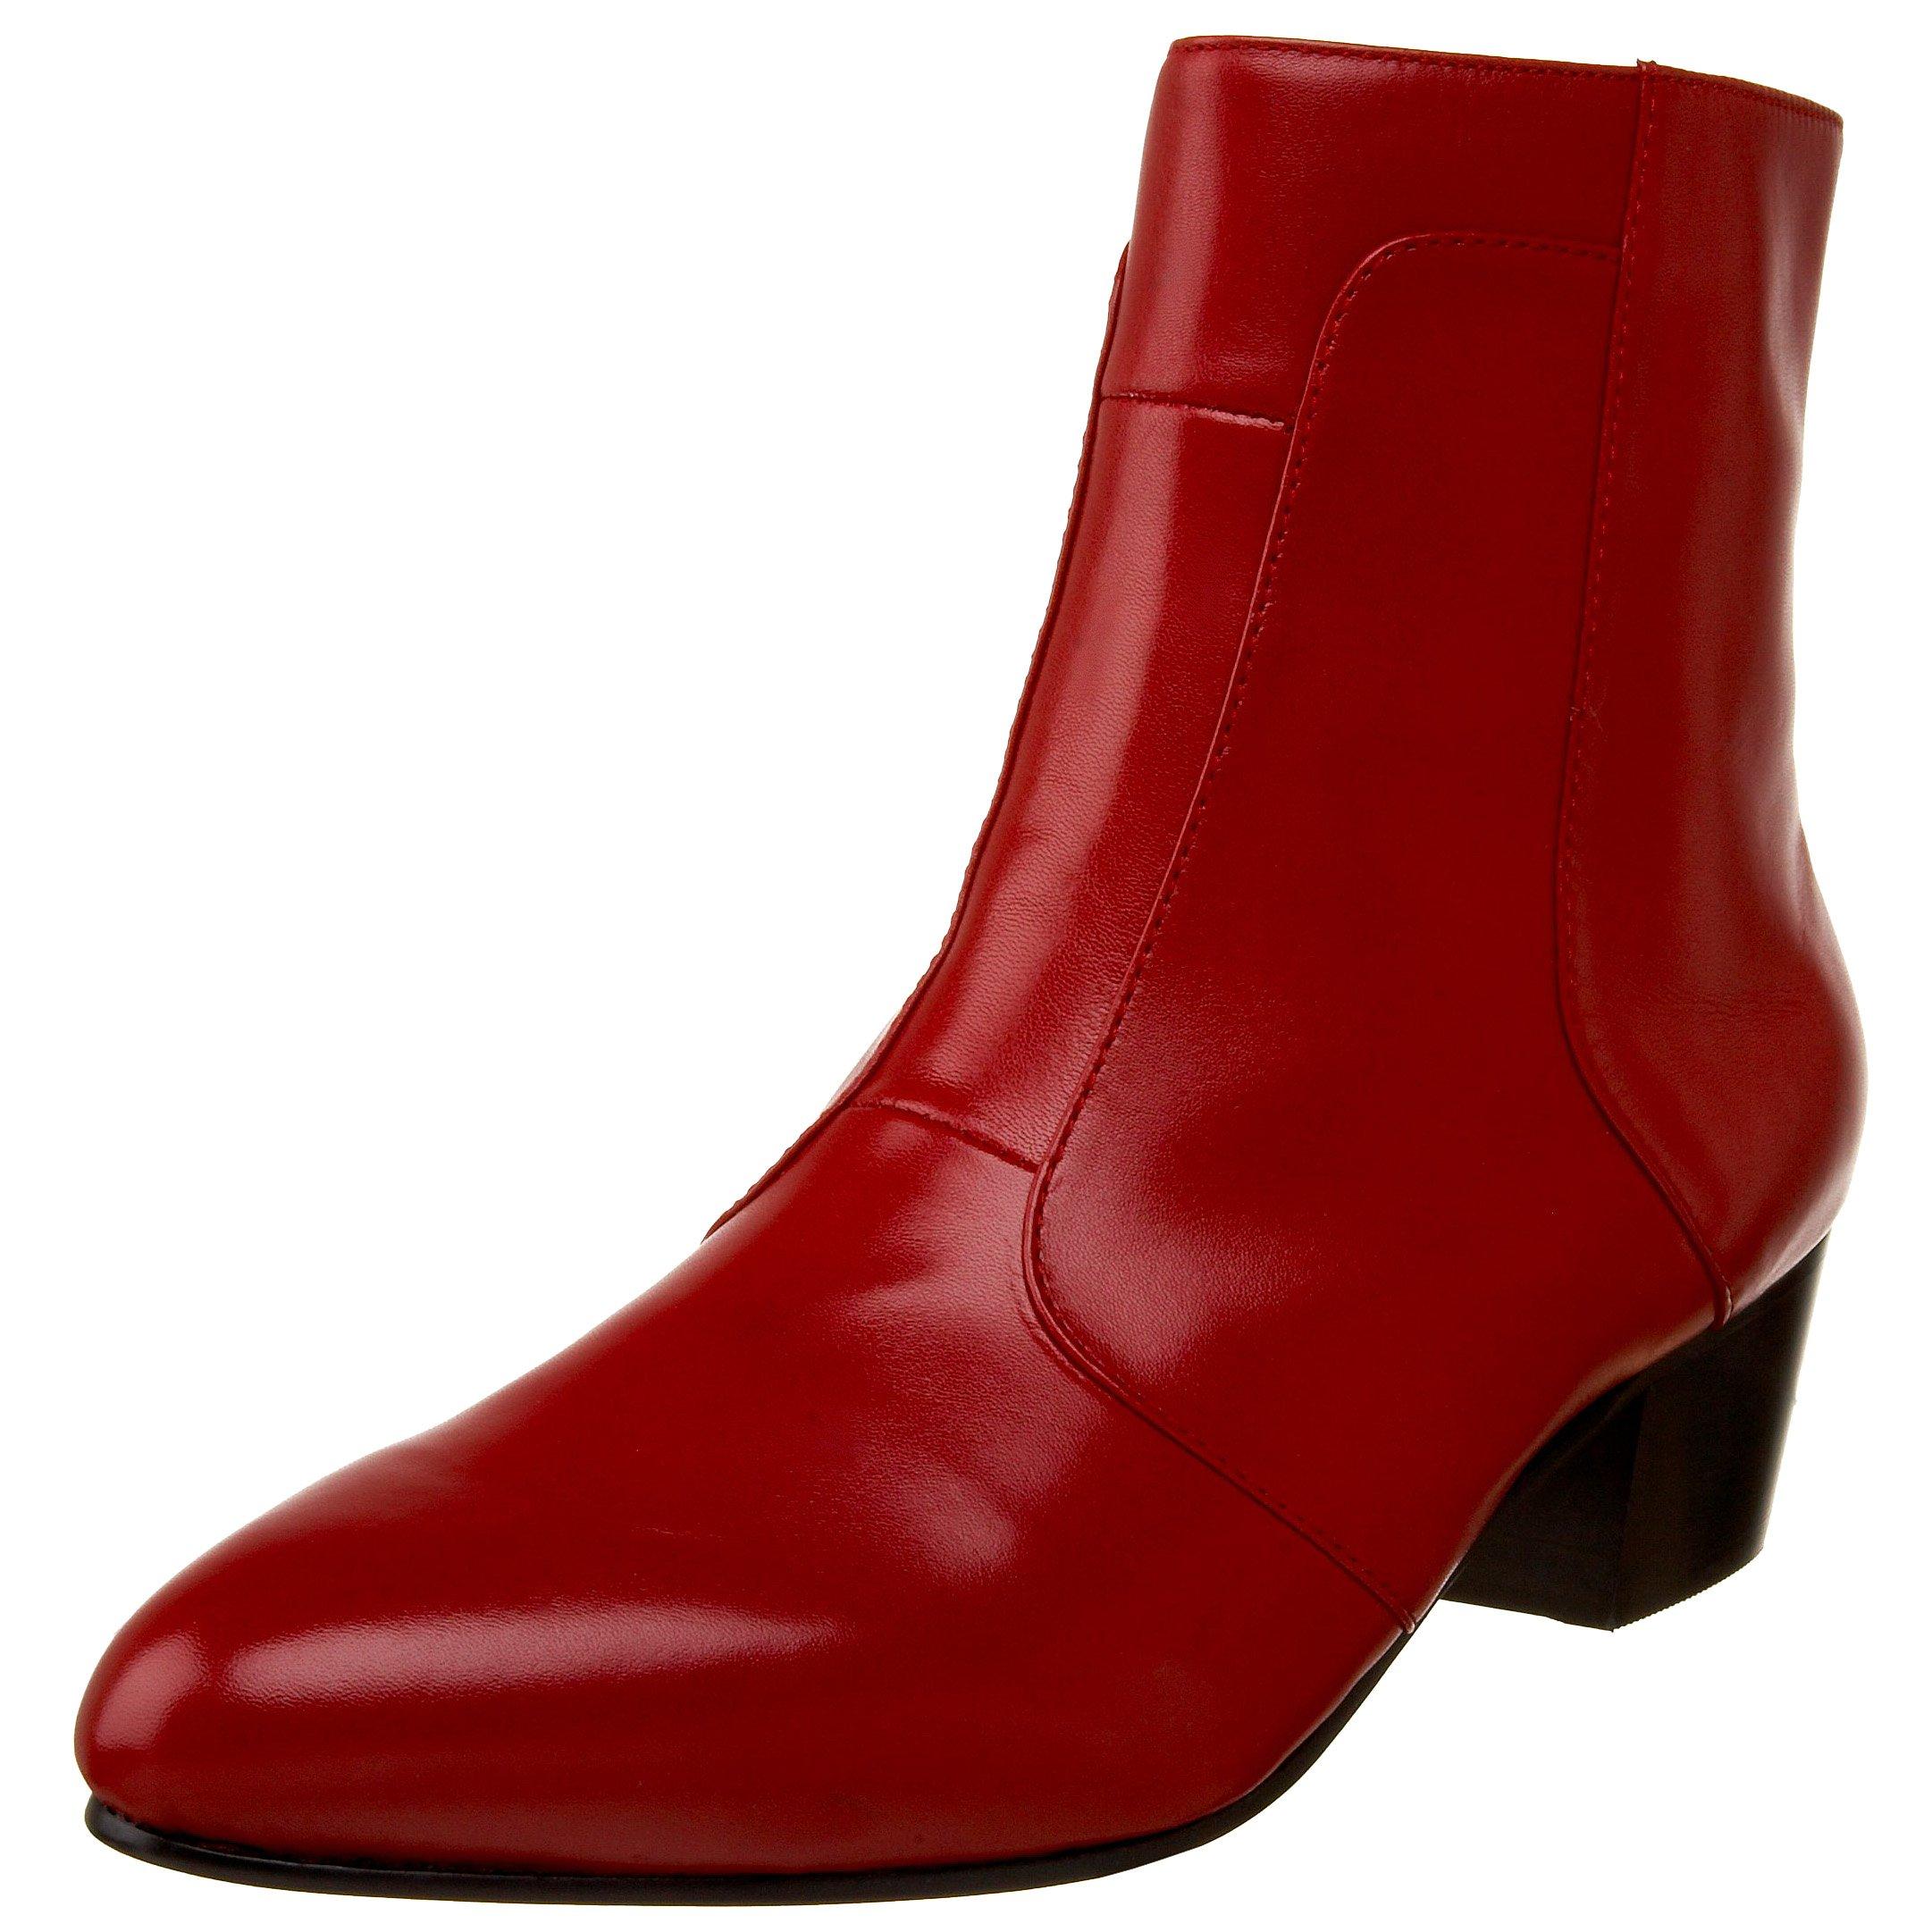 Giorgio Brutini Men's 805750 Boot,Red,10.5 M US